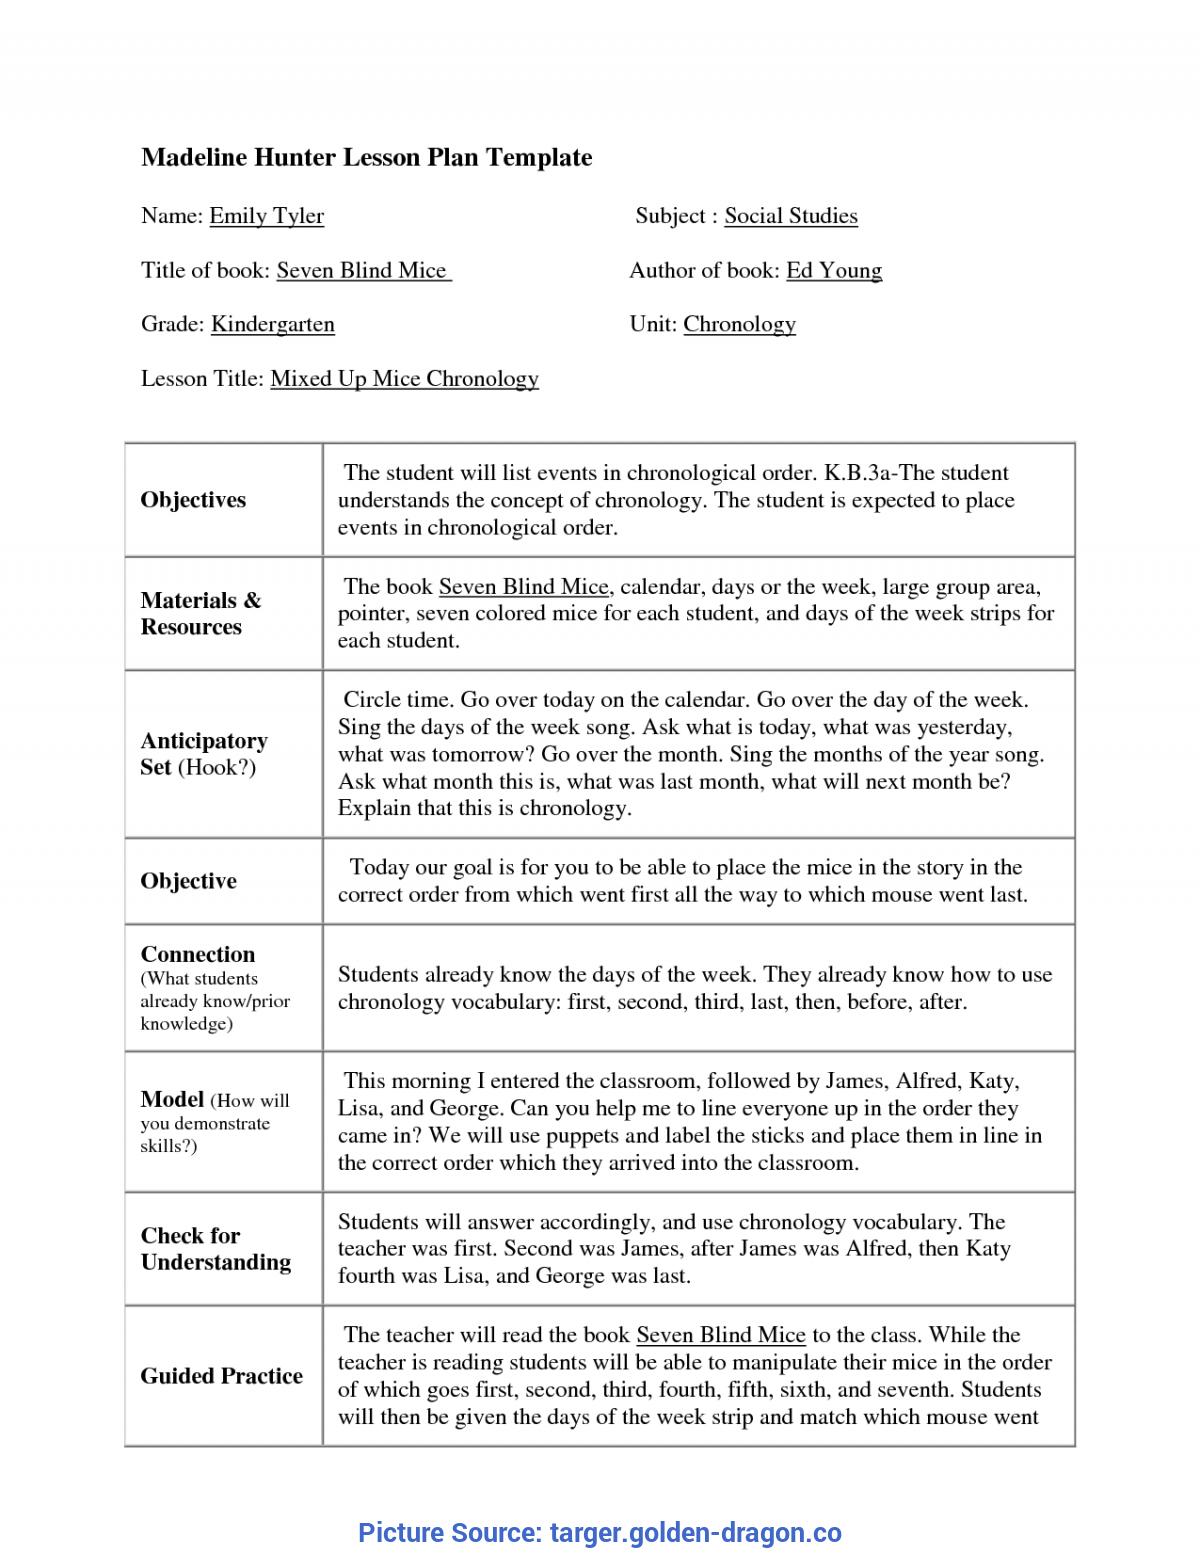 Madeline Hunter Lesson Plan Template Blank - Best Inside Madeline Hunter Lesson Plan Template Blank